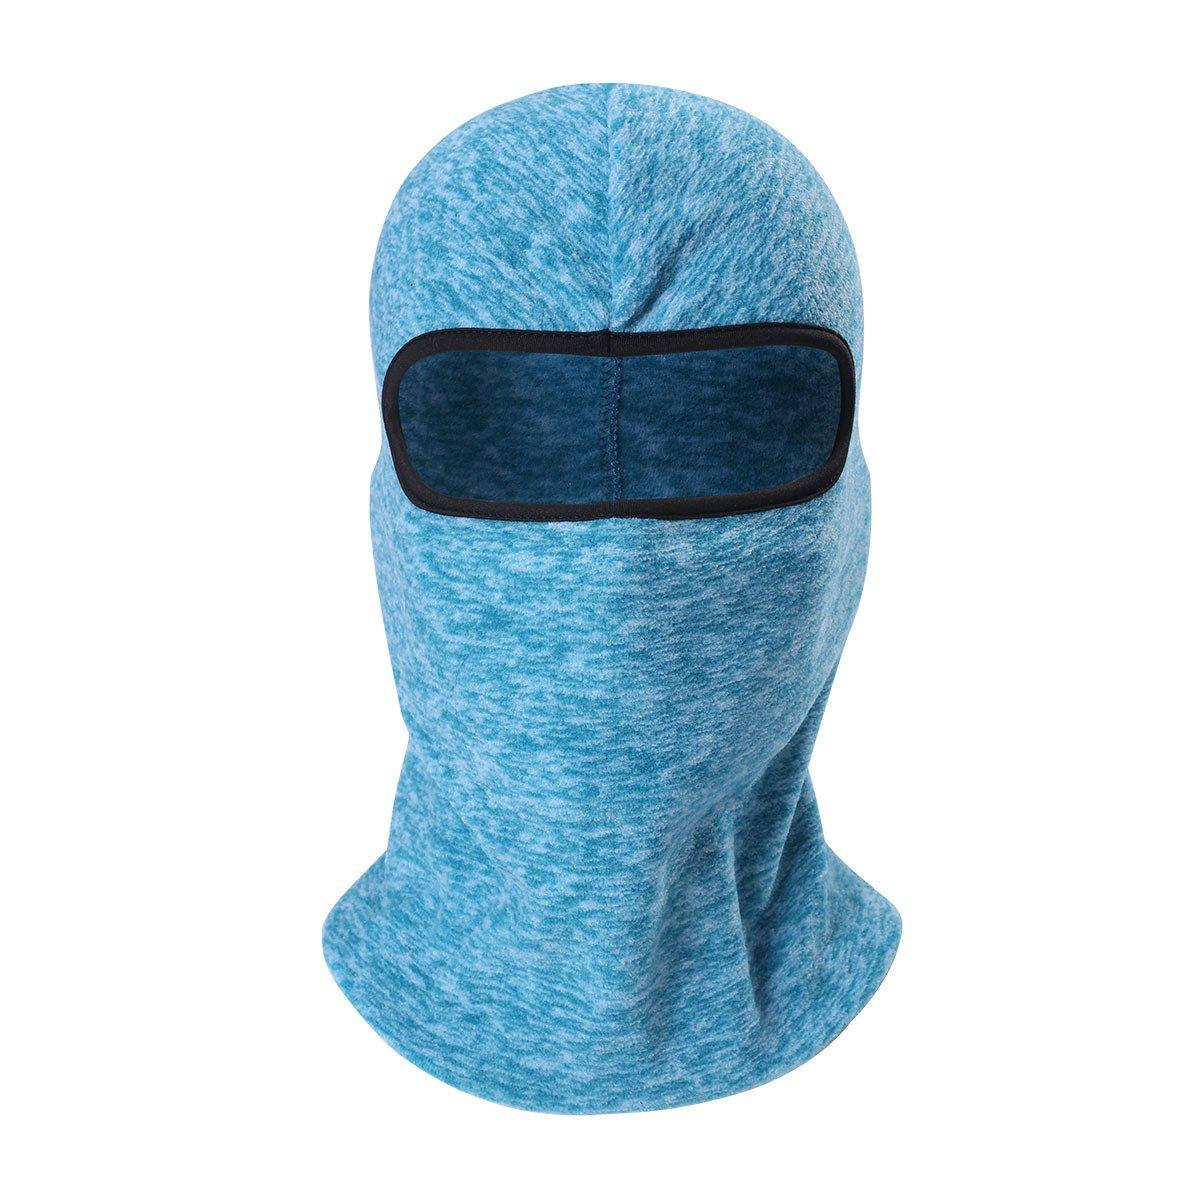 ECYC Cationic Fabric Balaclava Masks Winter Thermal Fleece Full Face Mask Neck Warmer Beanies,Lake Blue